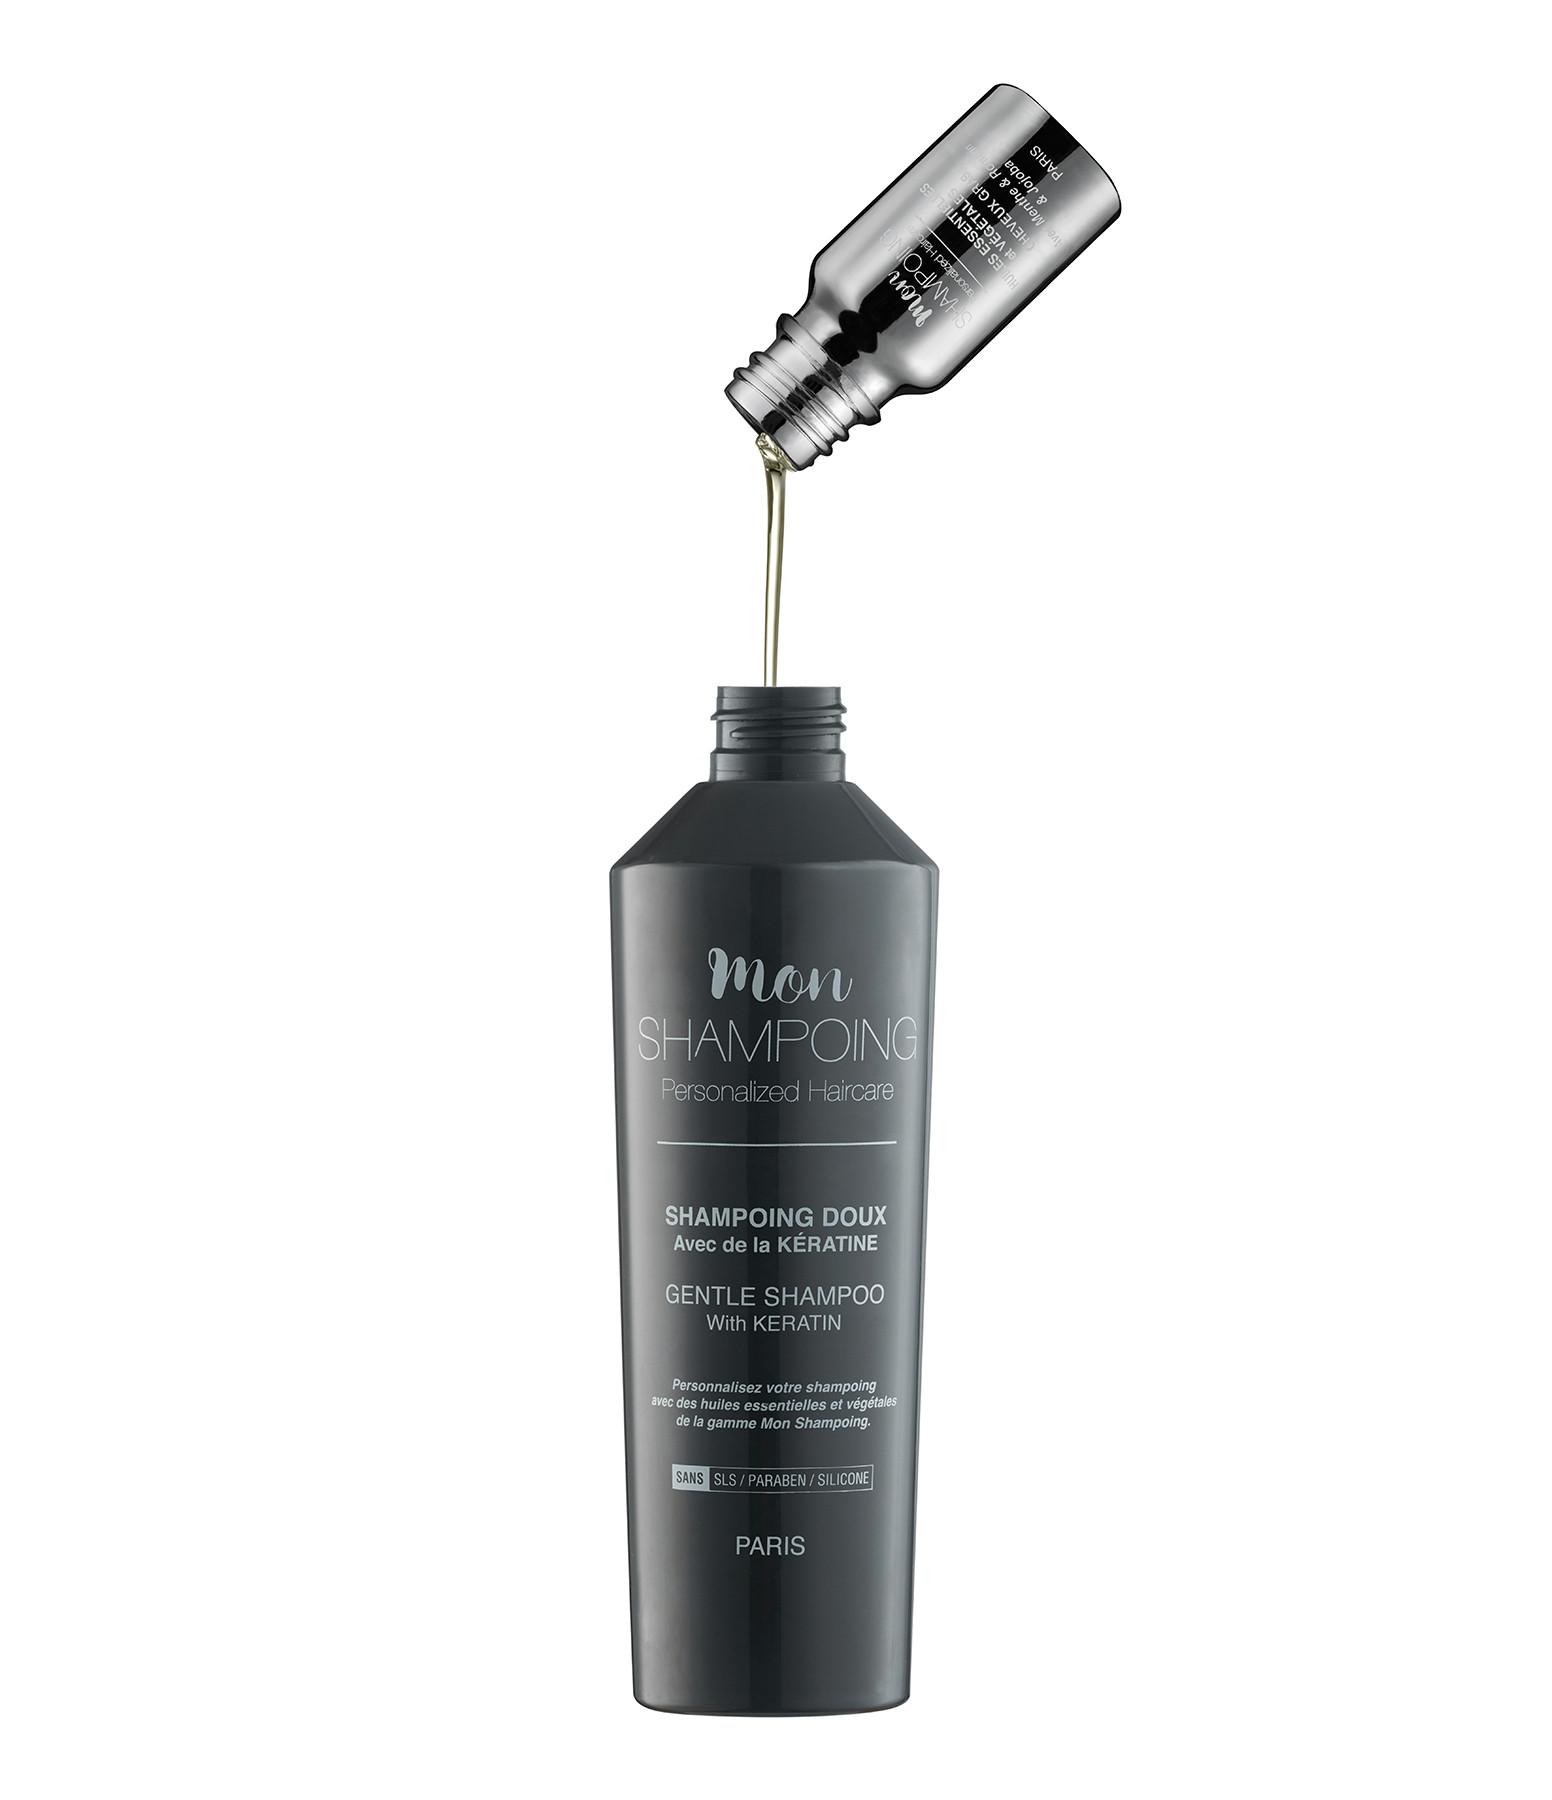 MON SHAMPOING - Shampoing Naturel Neutre Keratine 250 ml